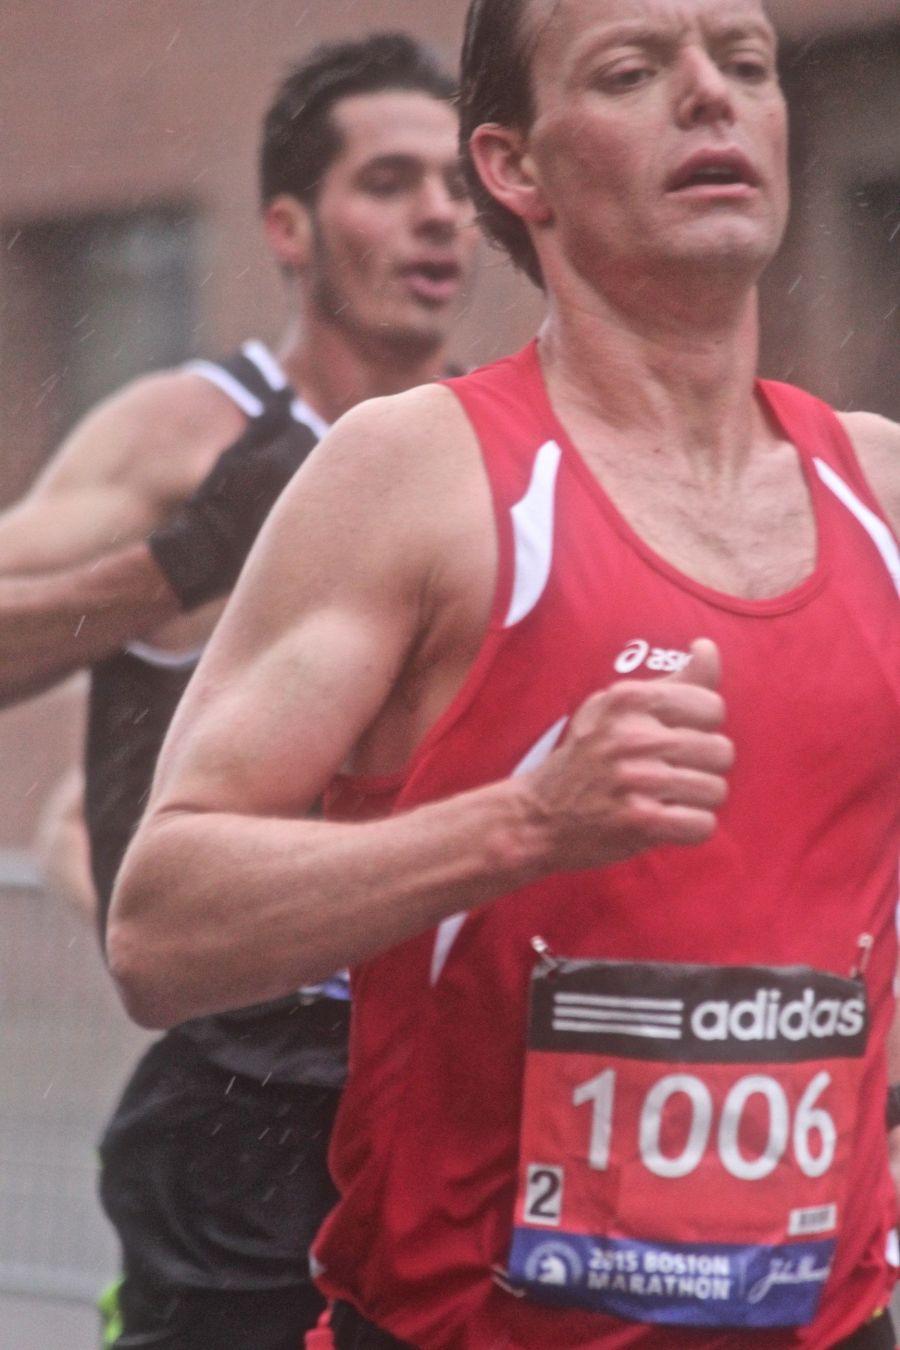 boston marathon april 20 2015 racer number 1006